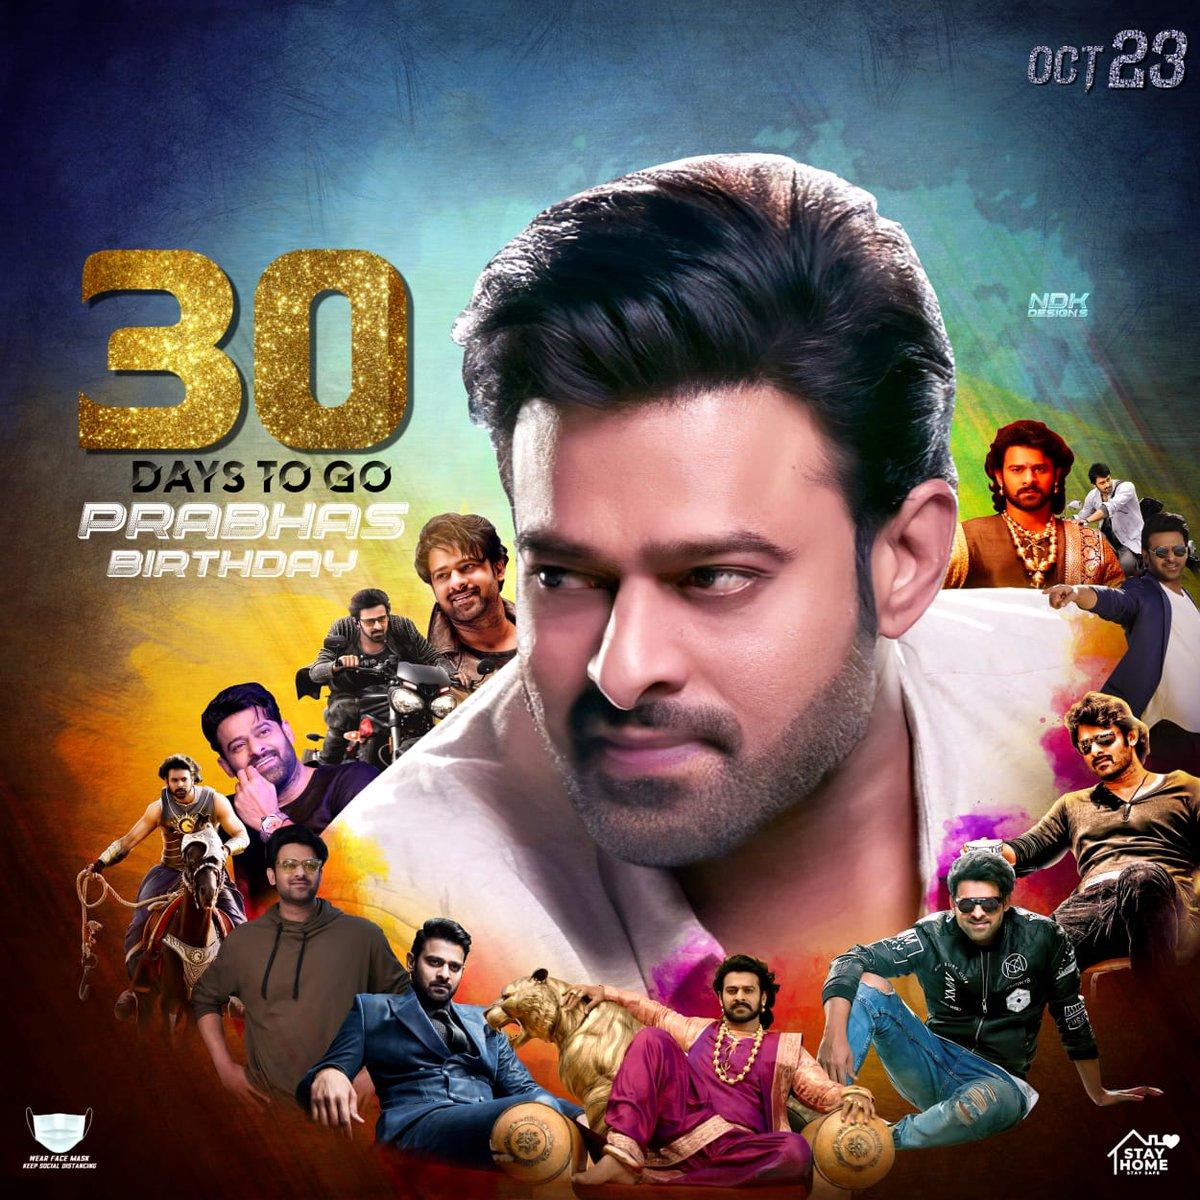 30 days to go for Rebel Star Birthday 💥💥🥳 #Prabhas https://t.co/ZppG5OAu4v